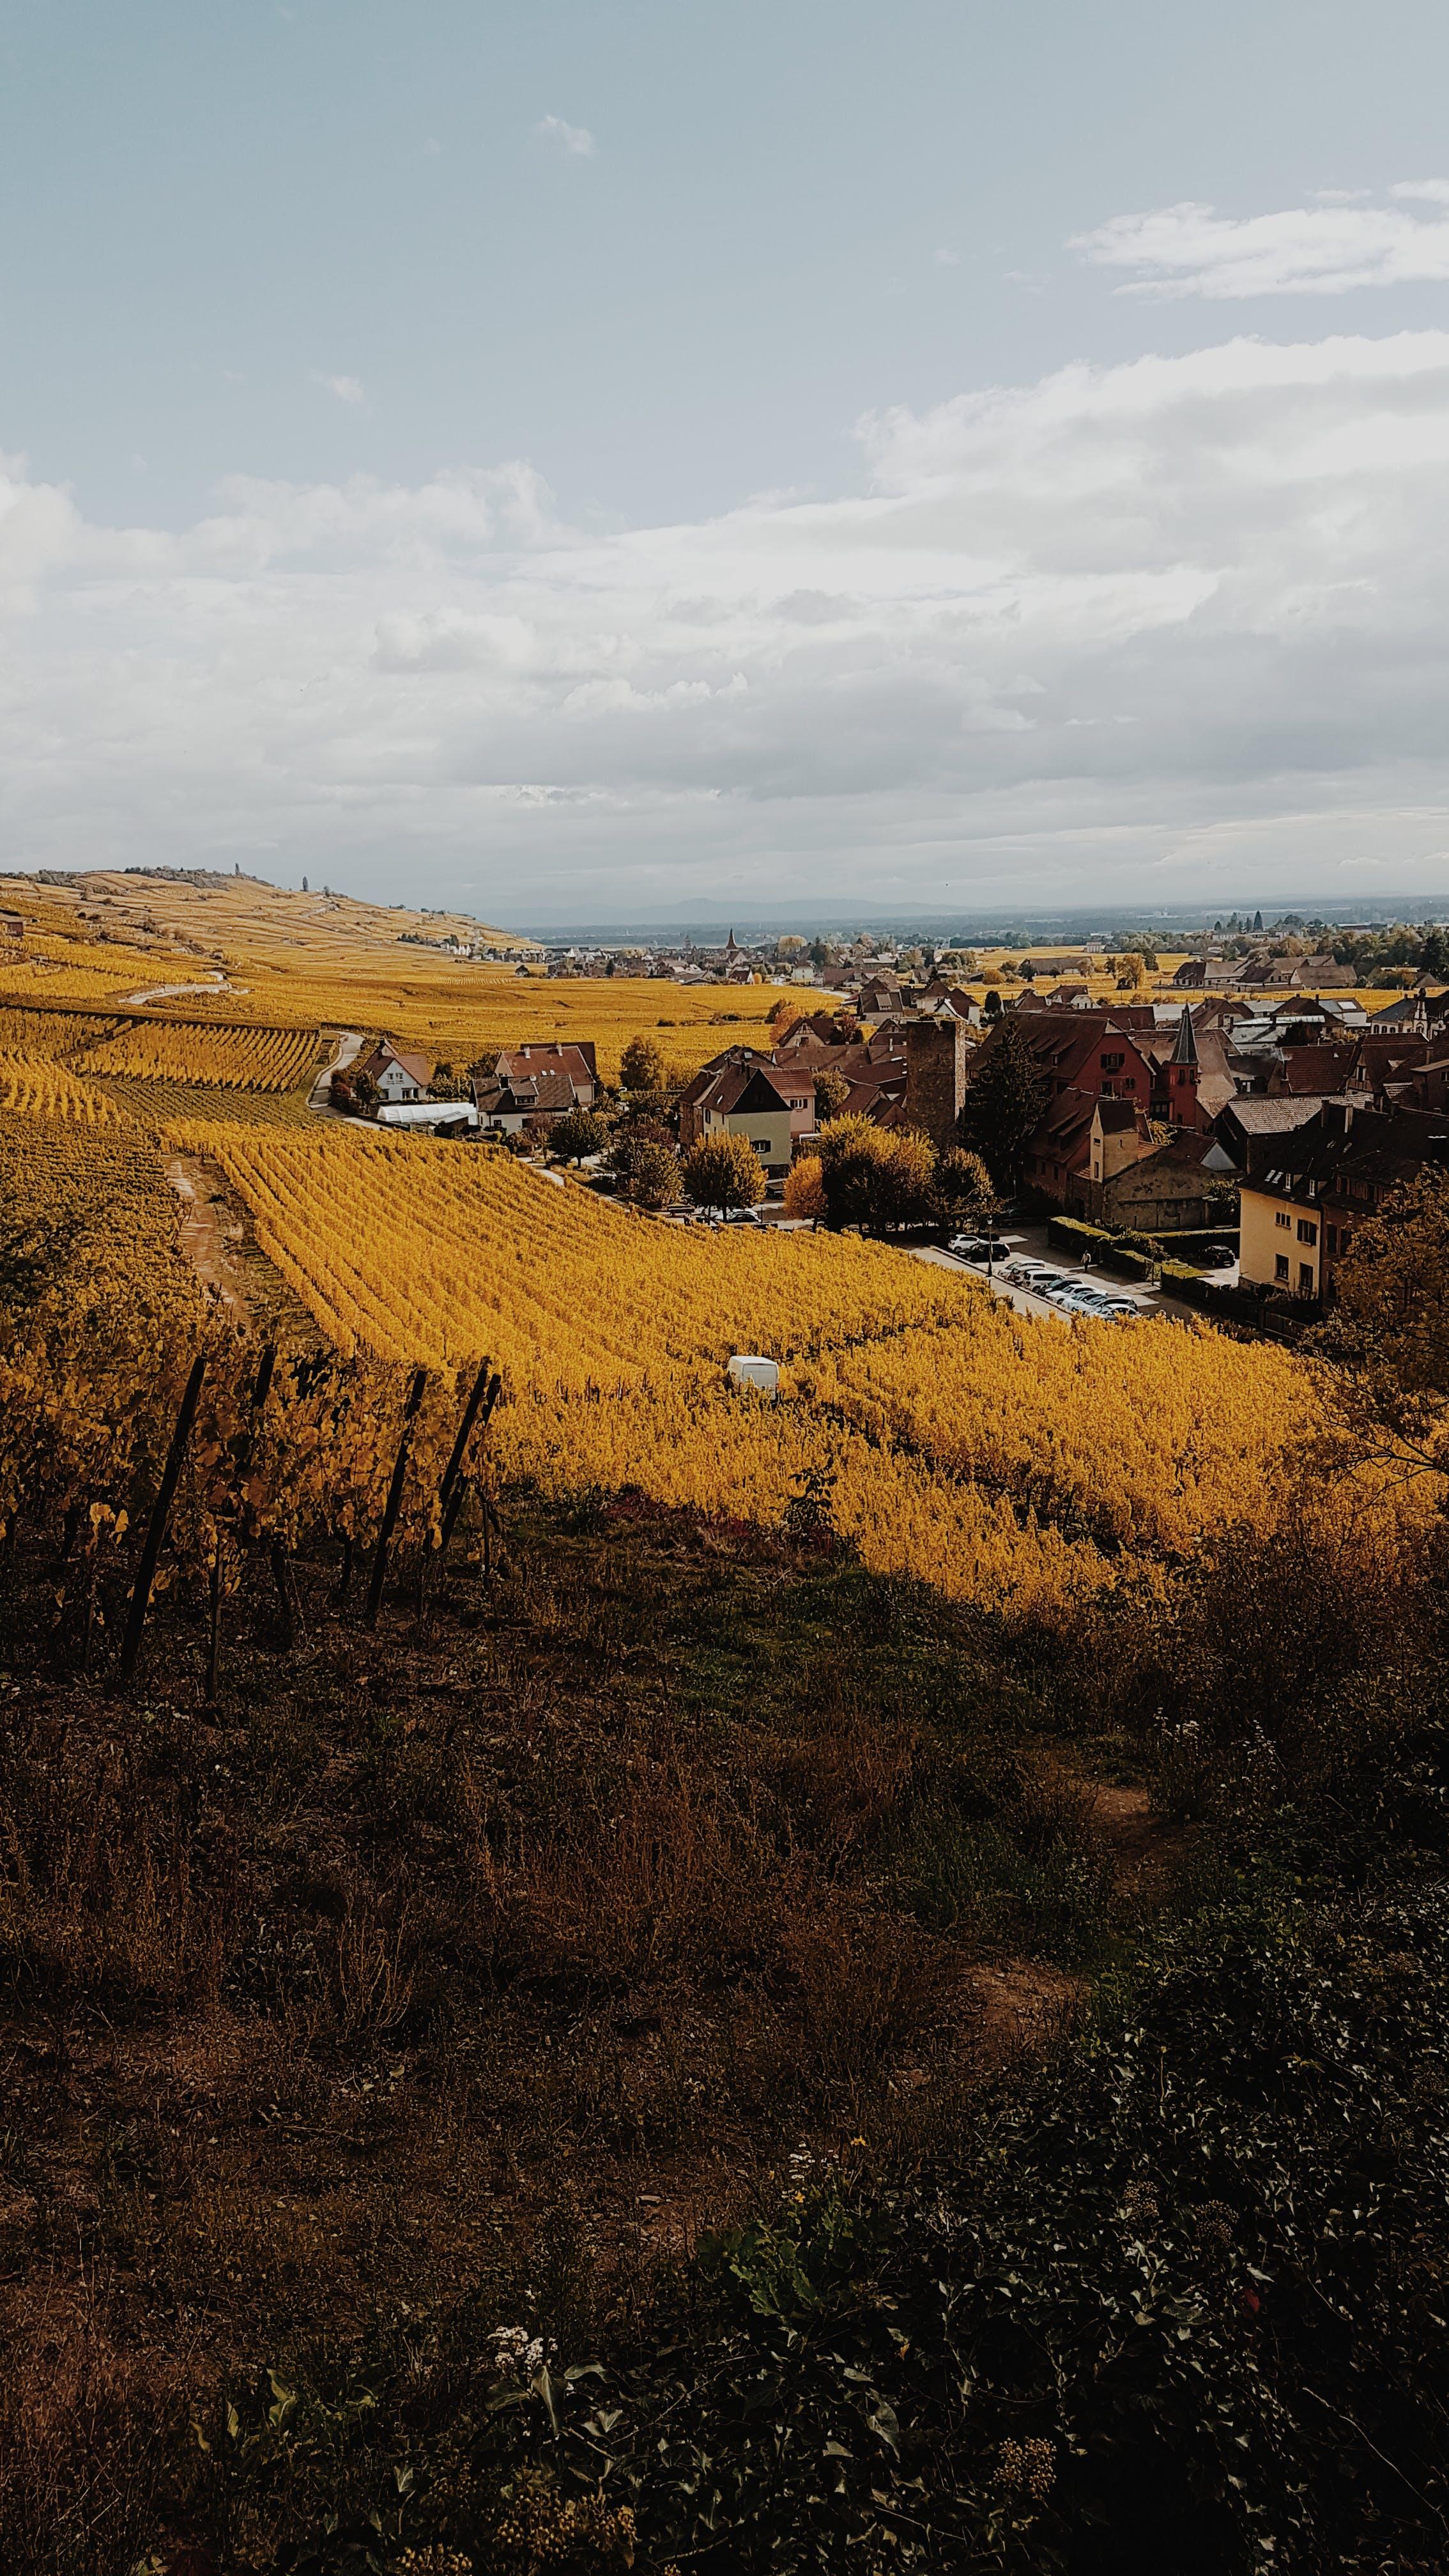 Kostnadsfri bild av åkermark, bondgård, by, dagsljus